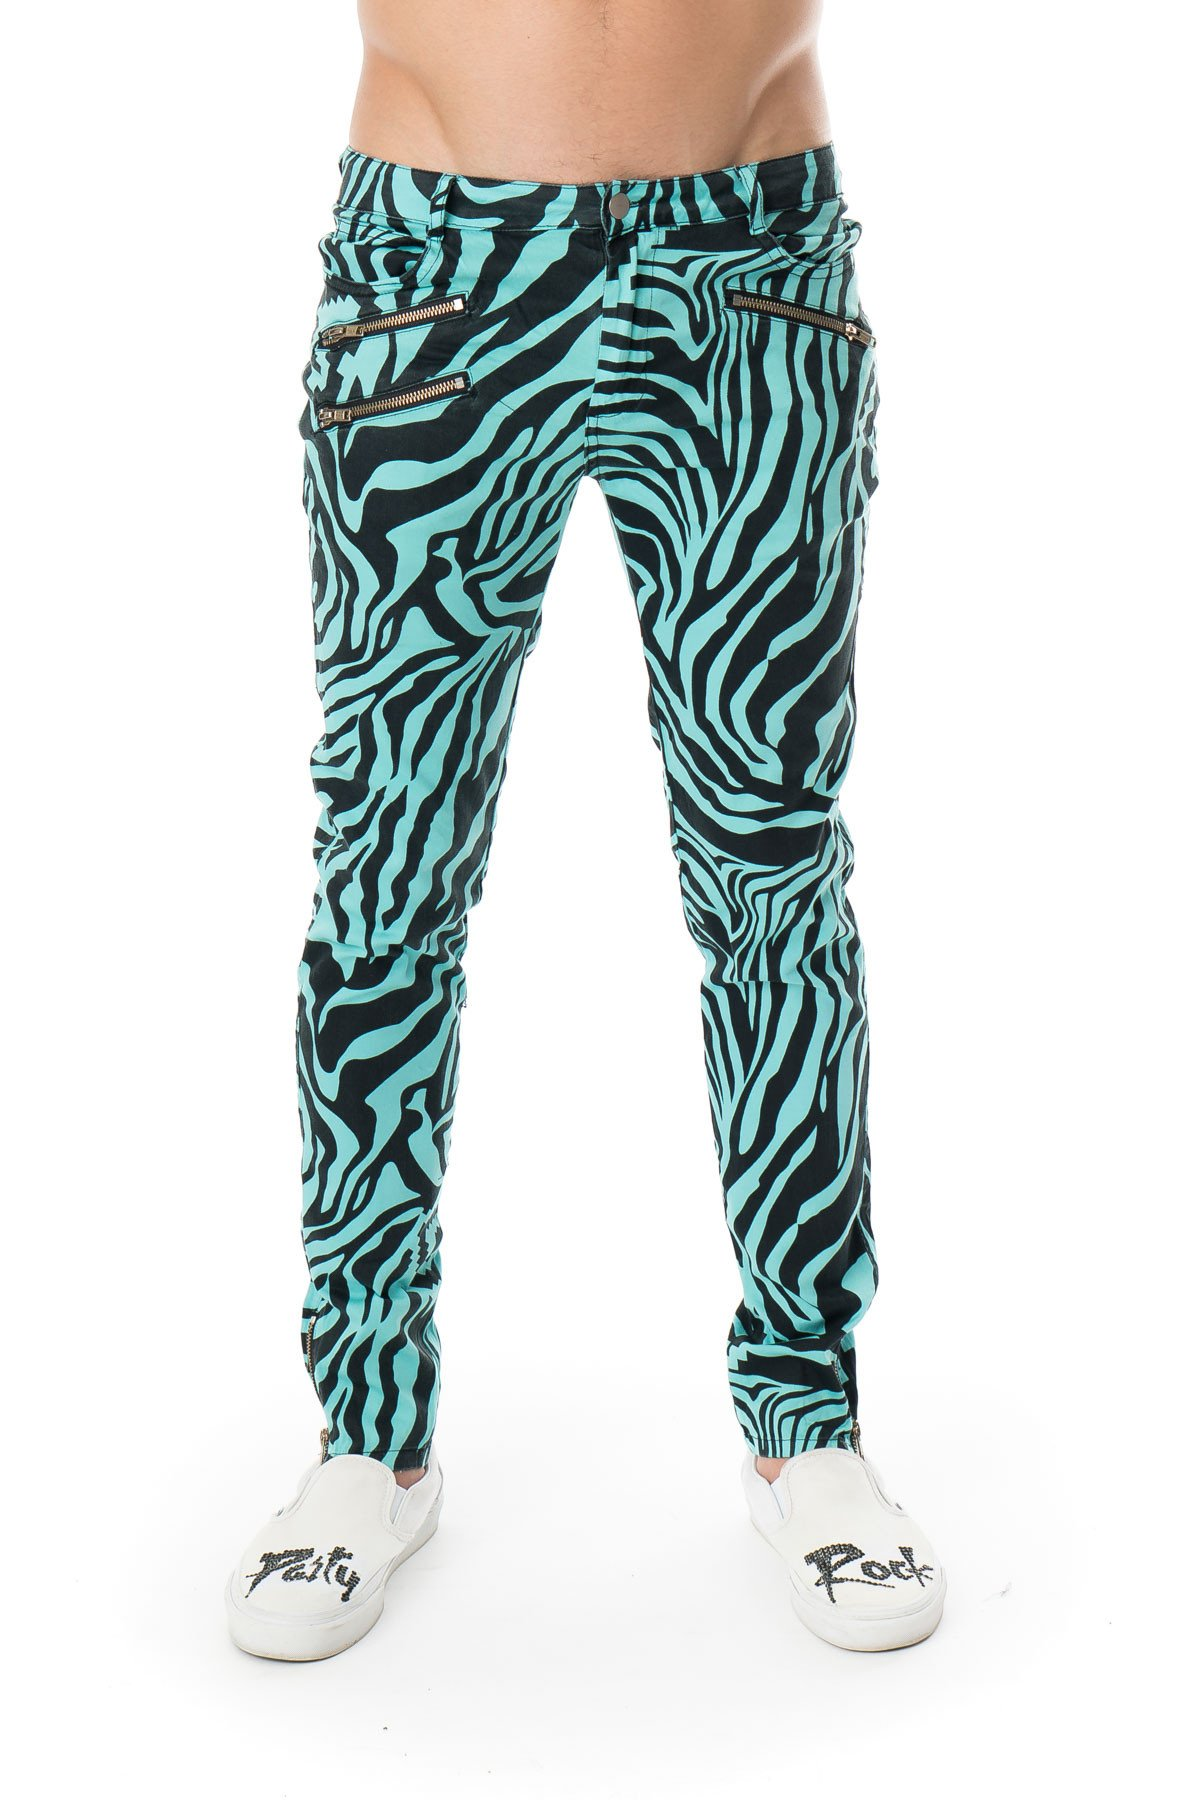 Party Rock Clothing★パーティーロッククロッシング ★La Freak Zebra Pants (アクア)